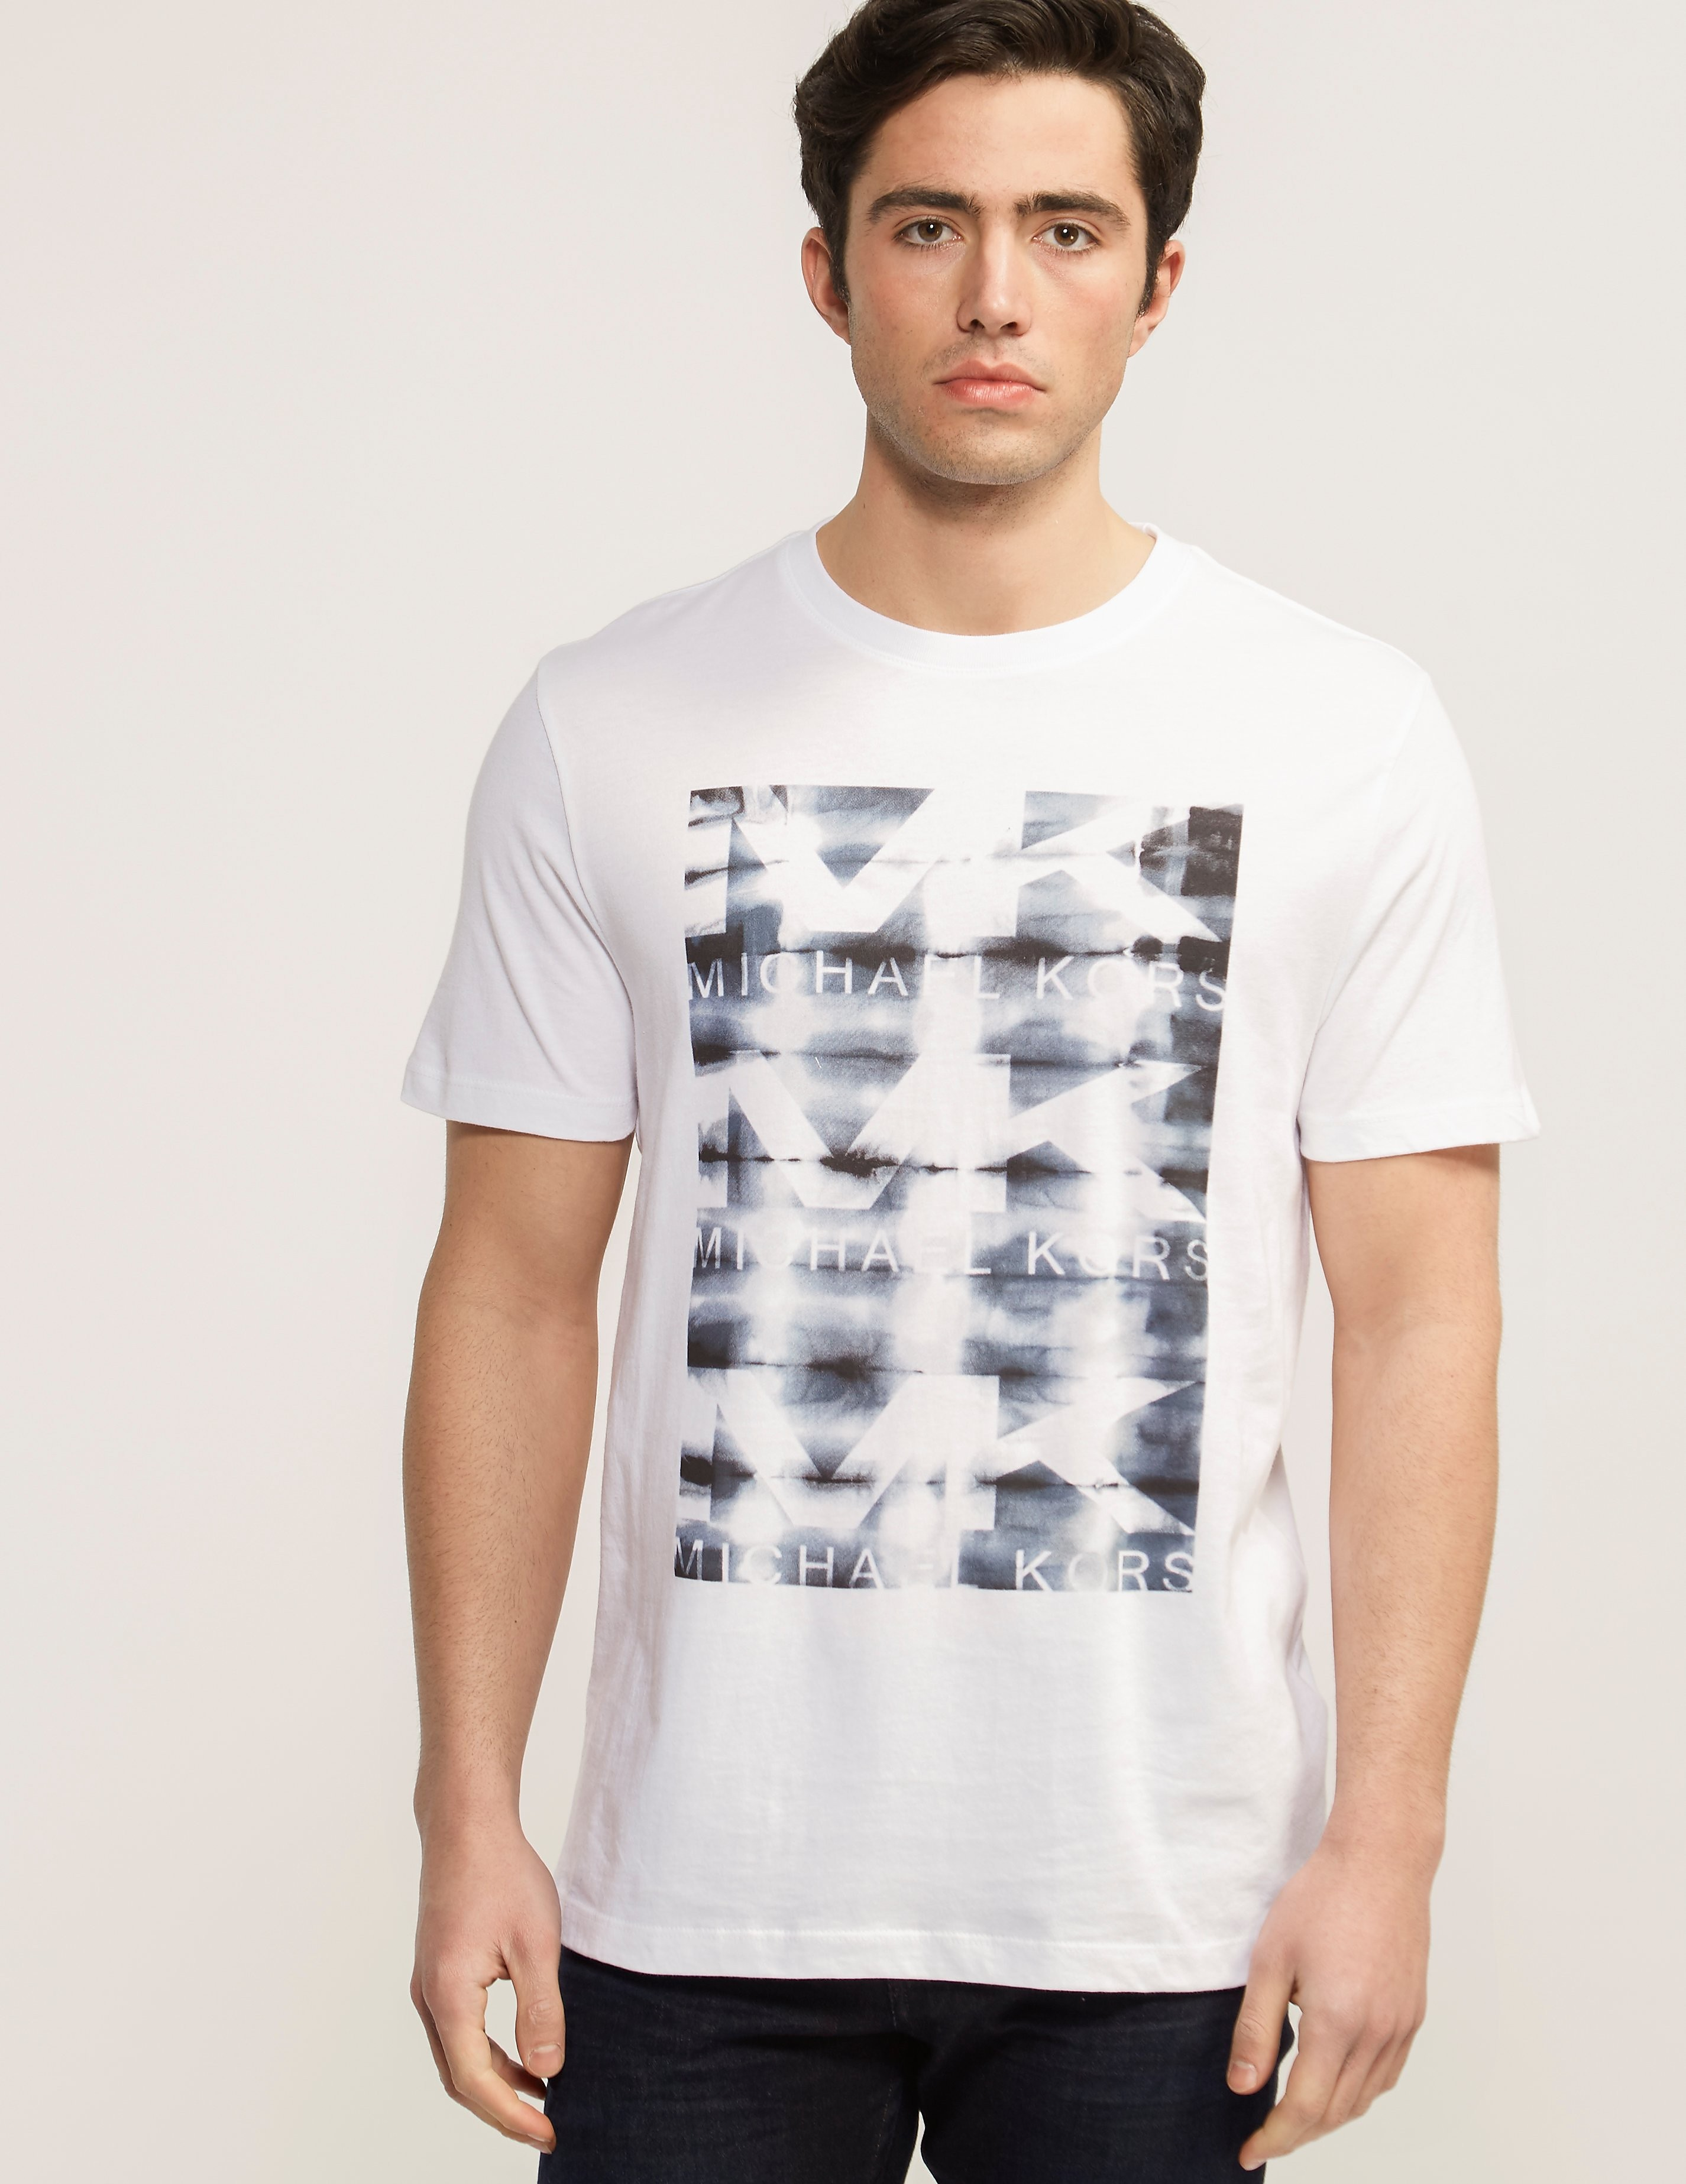 Michael Kors Ink Graphic T-shirt